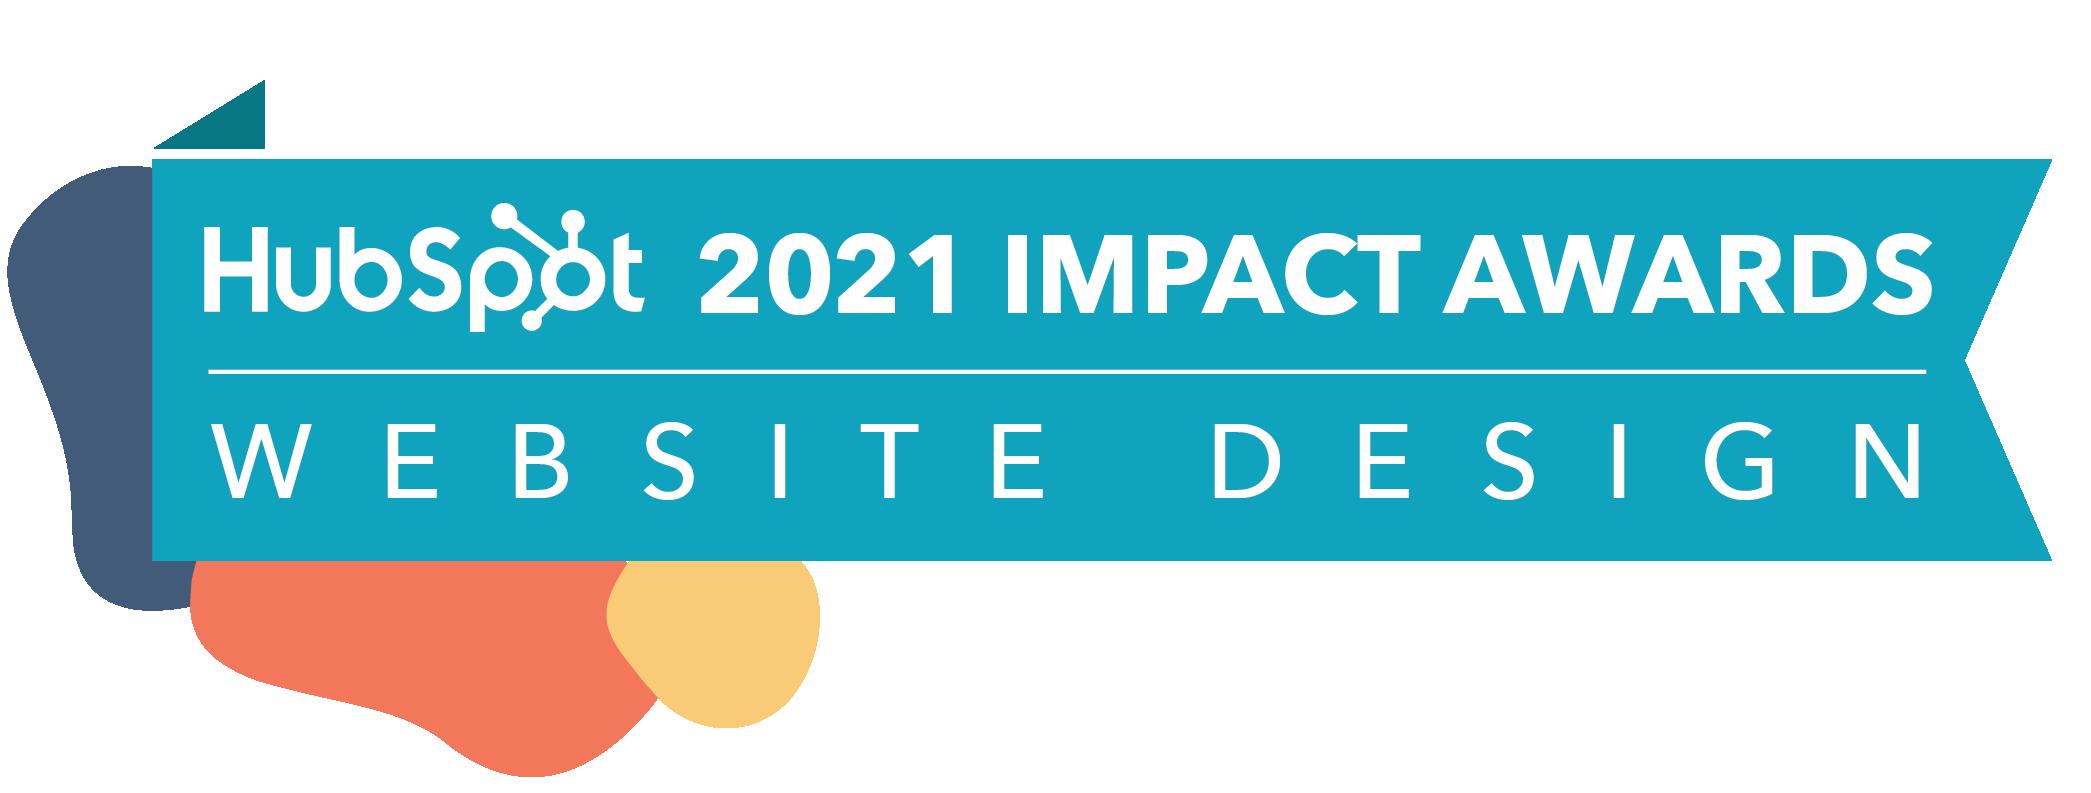 HubSpot_ImpactAwards_2021_WebsiteDesignBadge